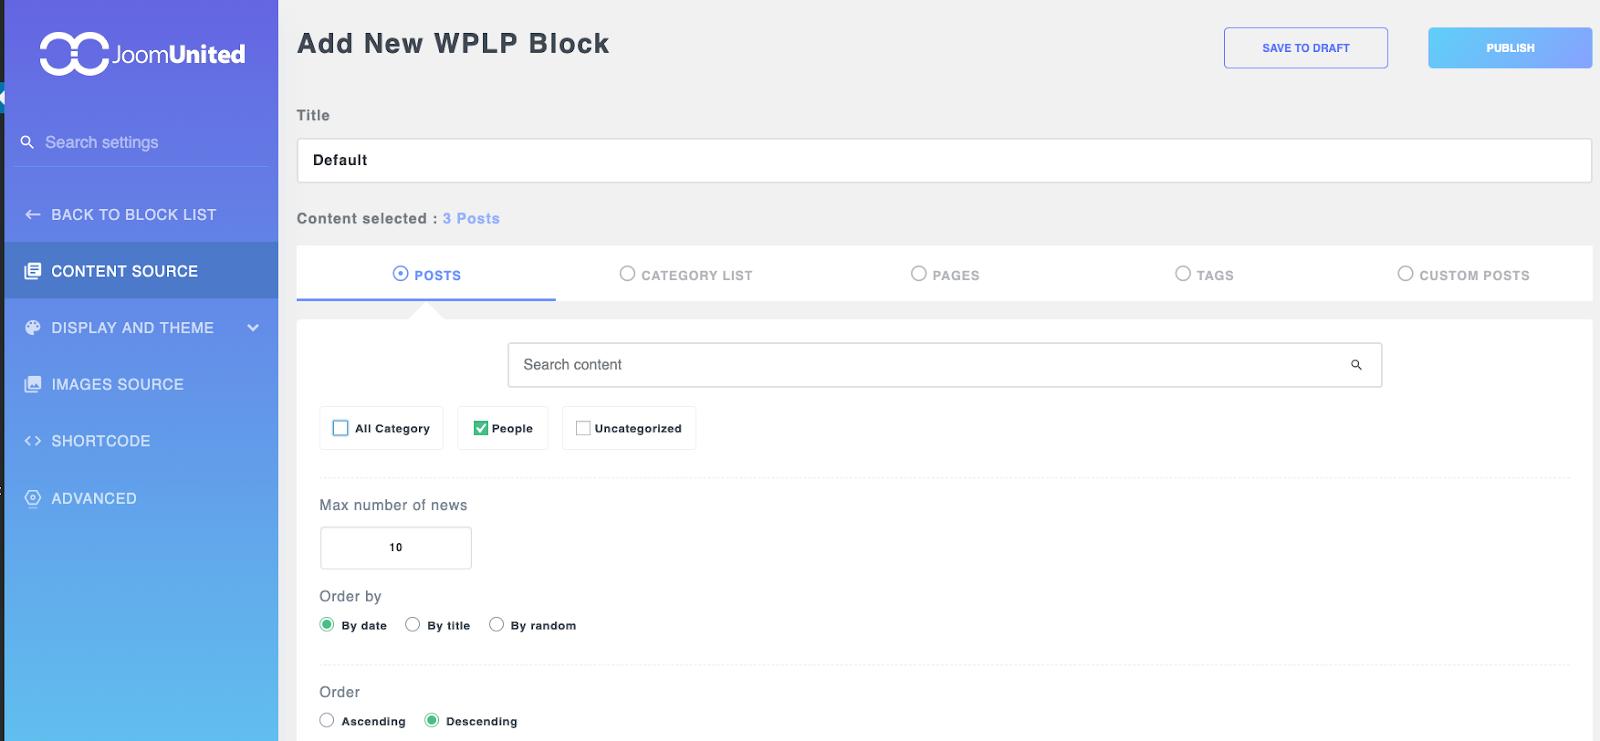 WP Latest Posts from JoomUnited WordPress Developer Bundle